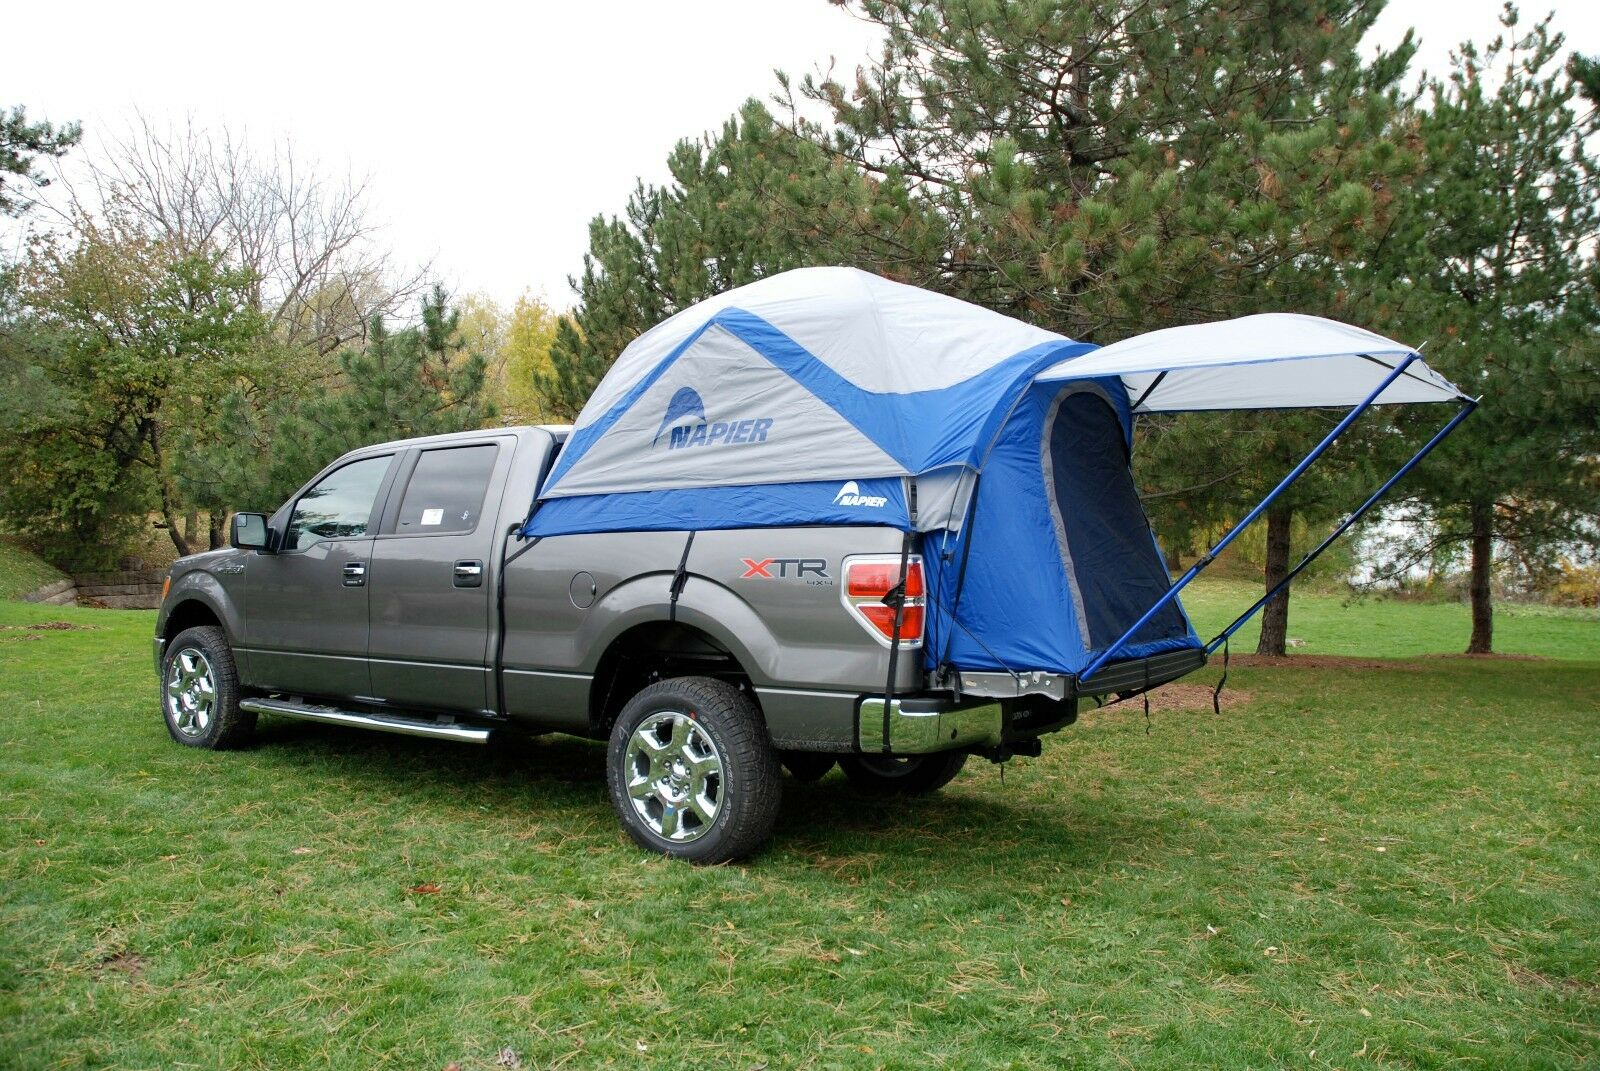 Napier Sportz Truck Tent Full Size Short Box Camping Outdoor 57022 6.5ft Bed